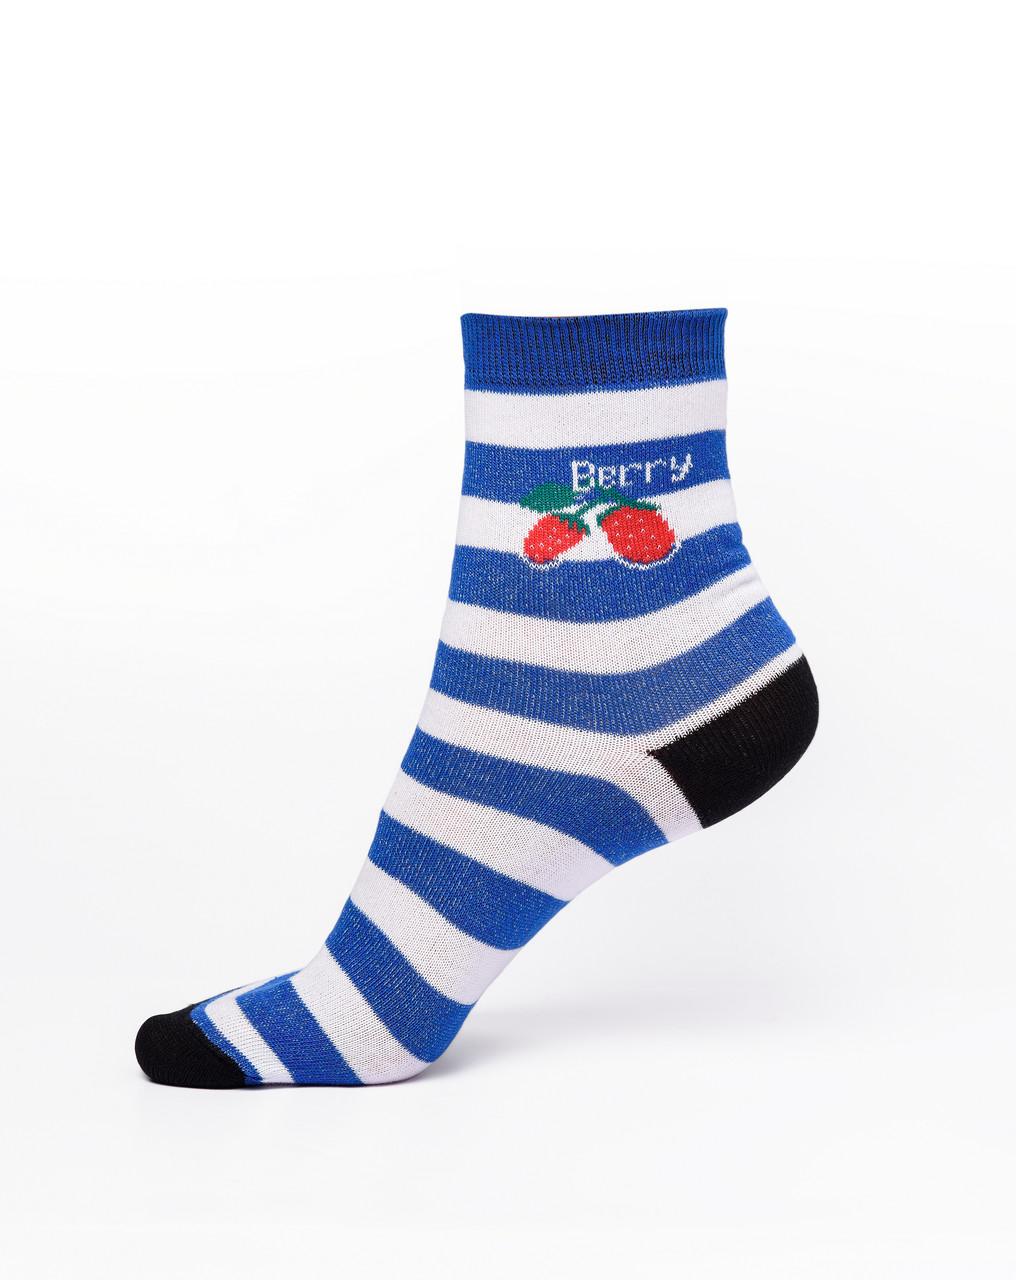 Женские носки в полоску,синие